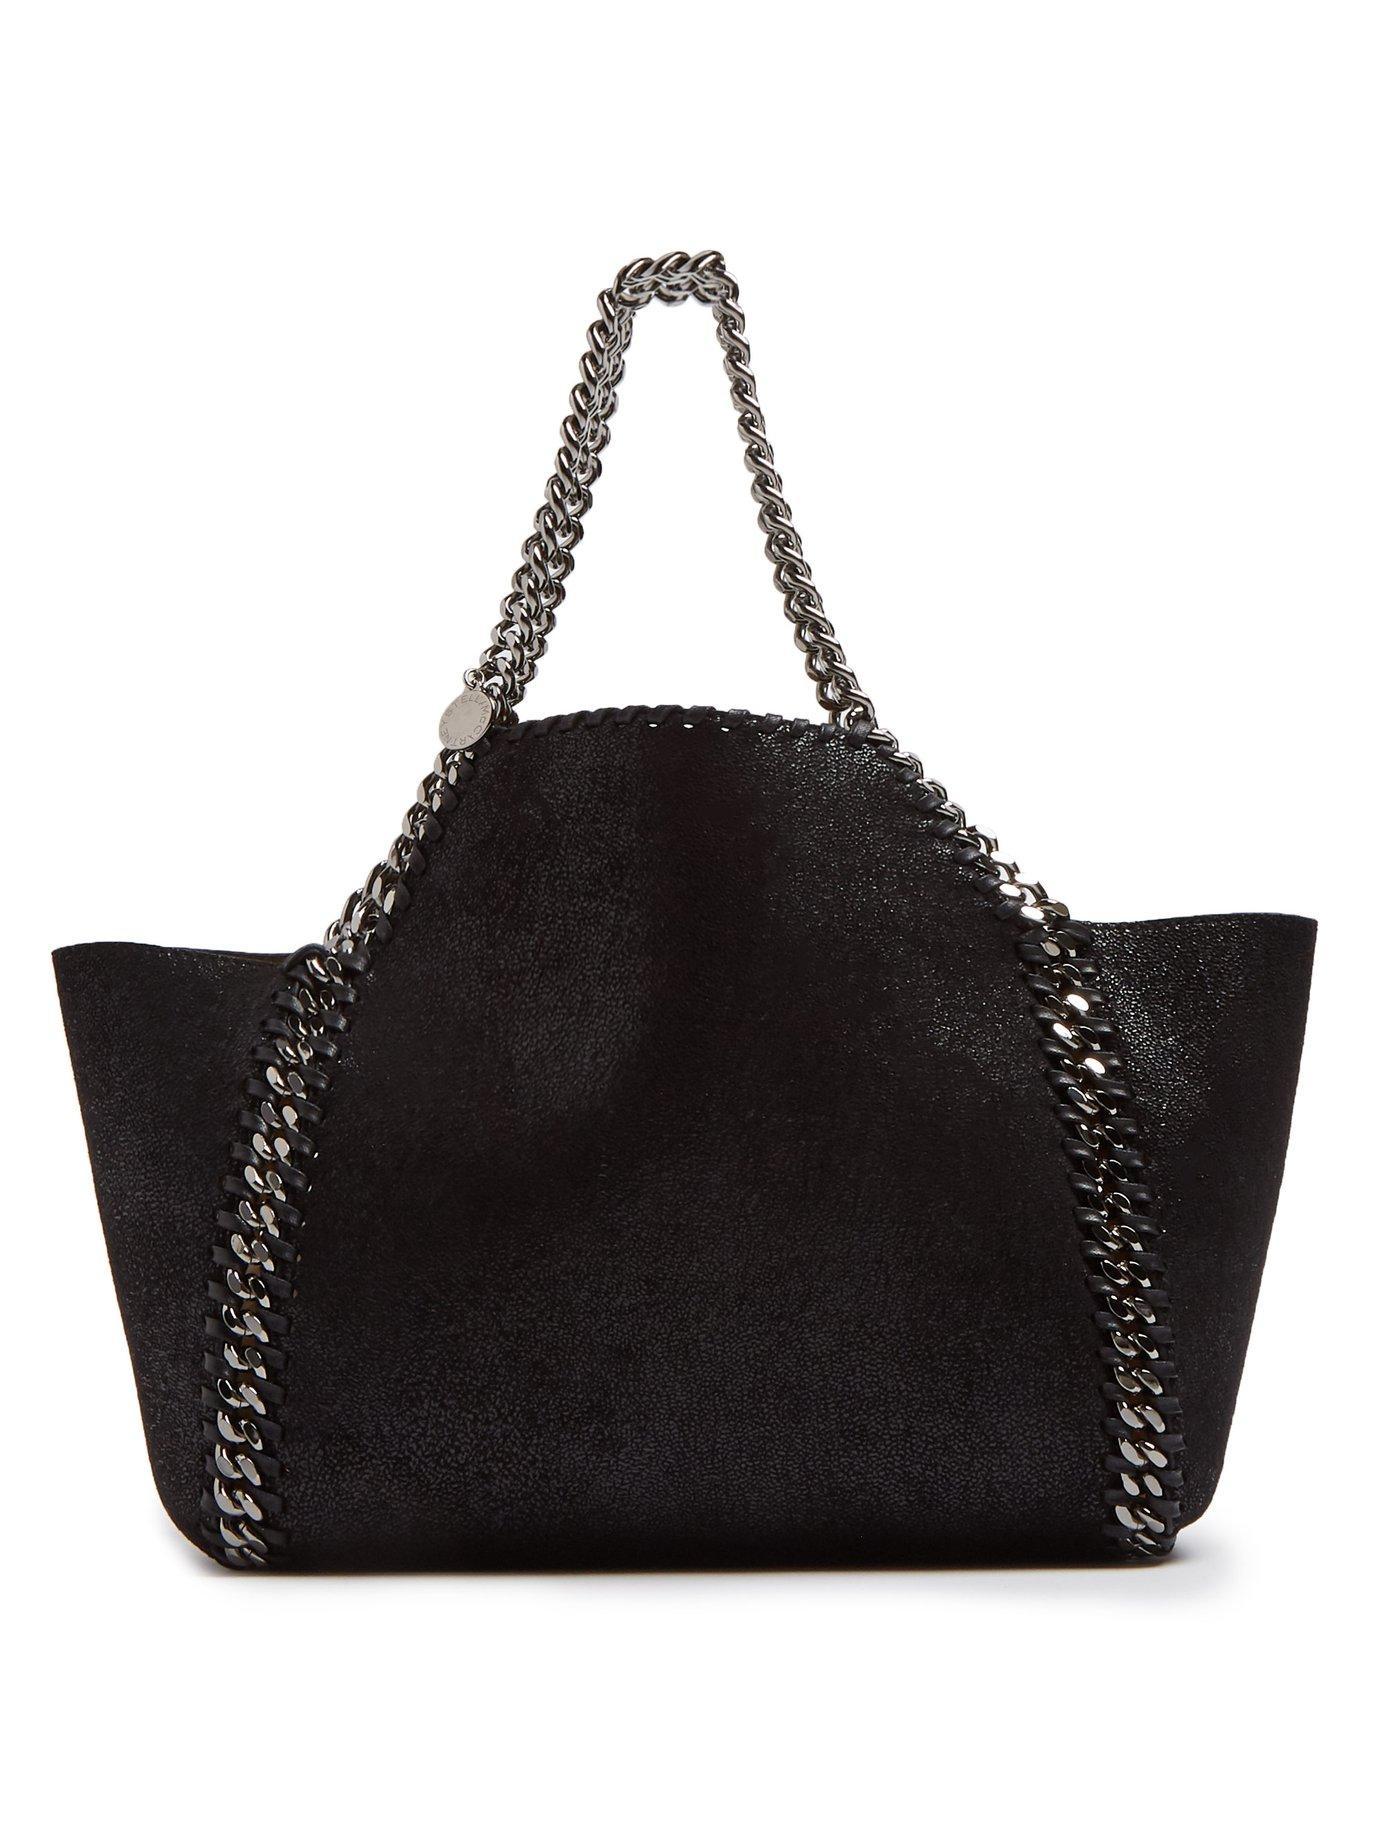 8b508bfd5fce Stella McCartney. Women s Black Falabella Mini Reversible Faux Leather Tote  Bag